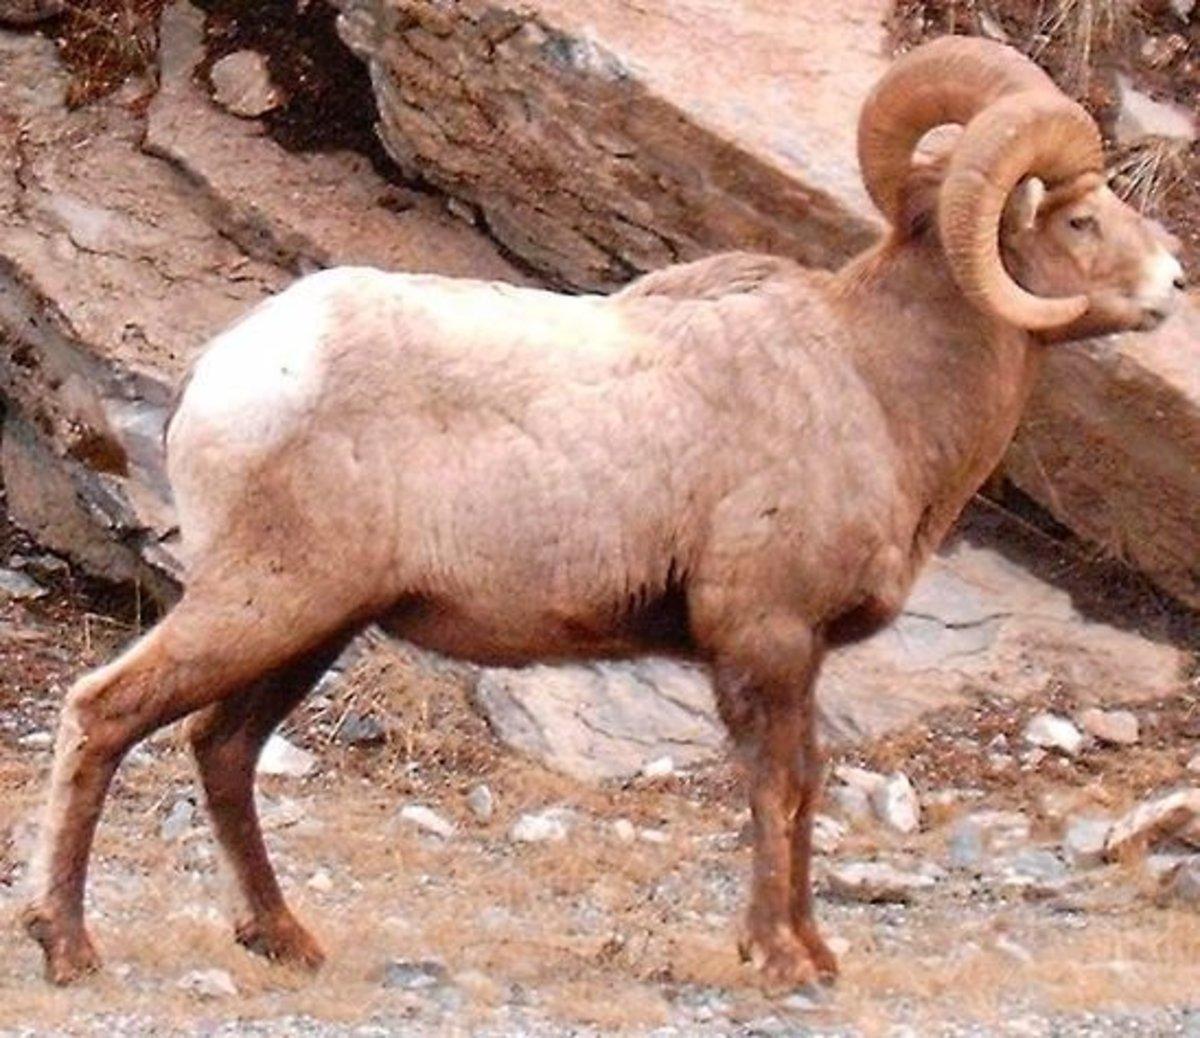 A ram – The ram's horn is kosher for a Rosh Hashanah shofar.